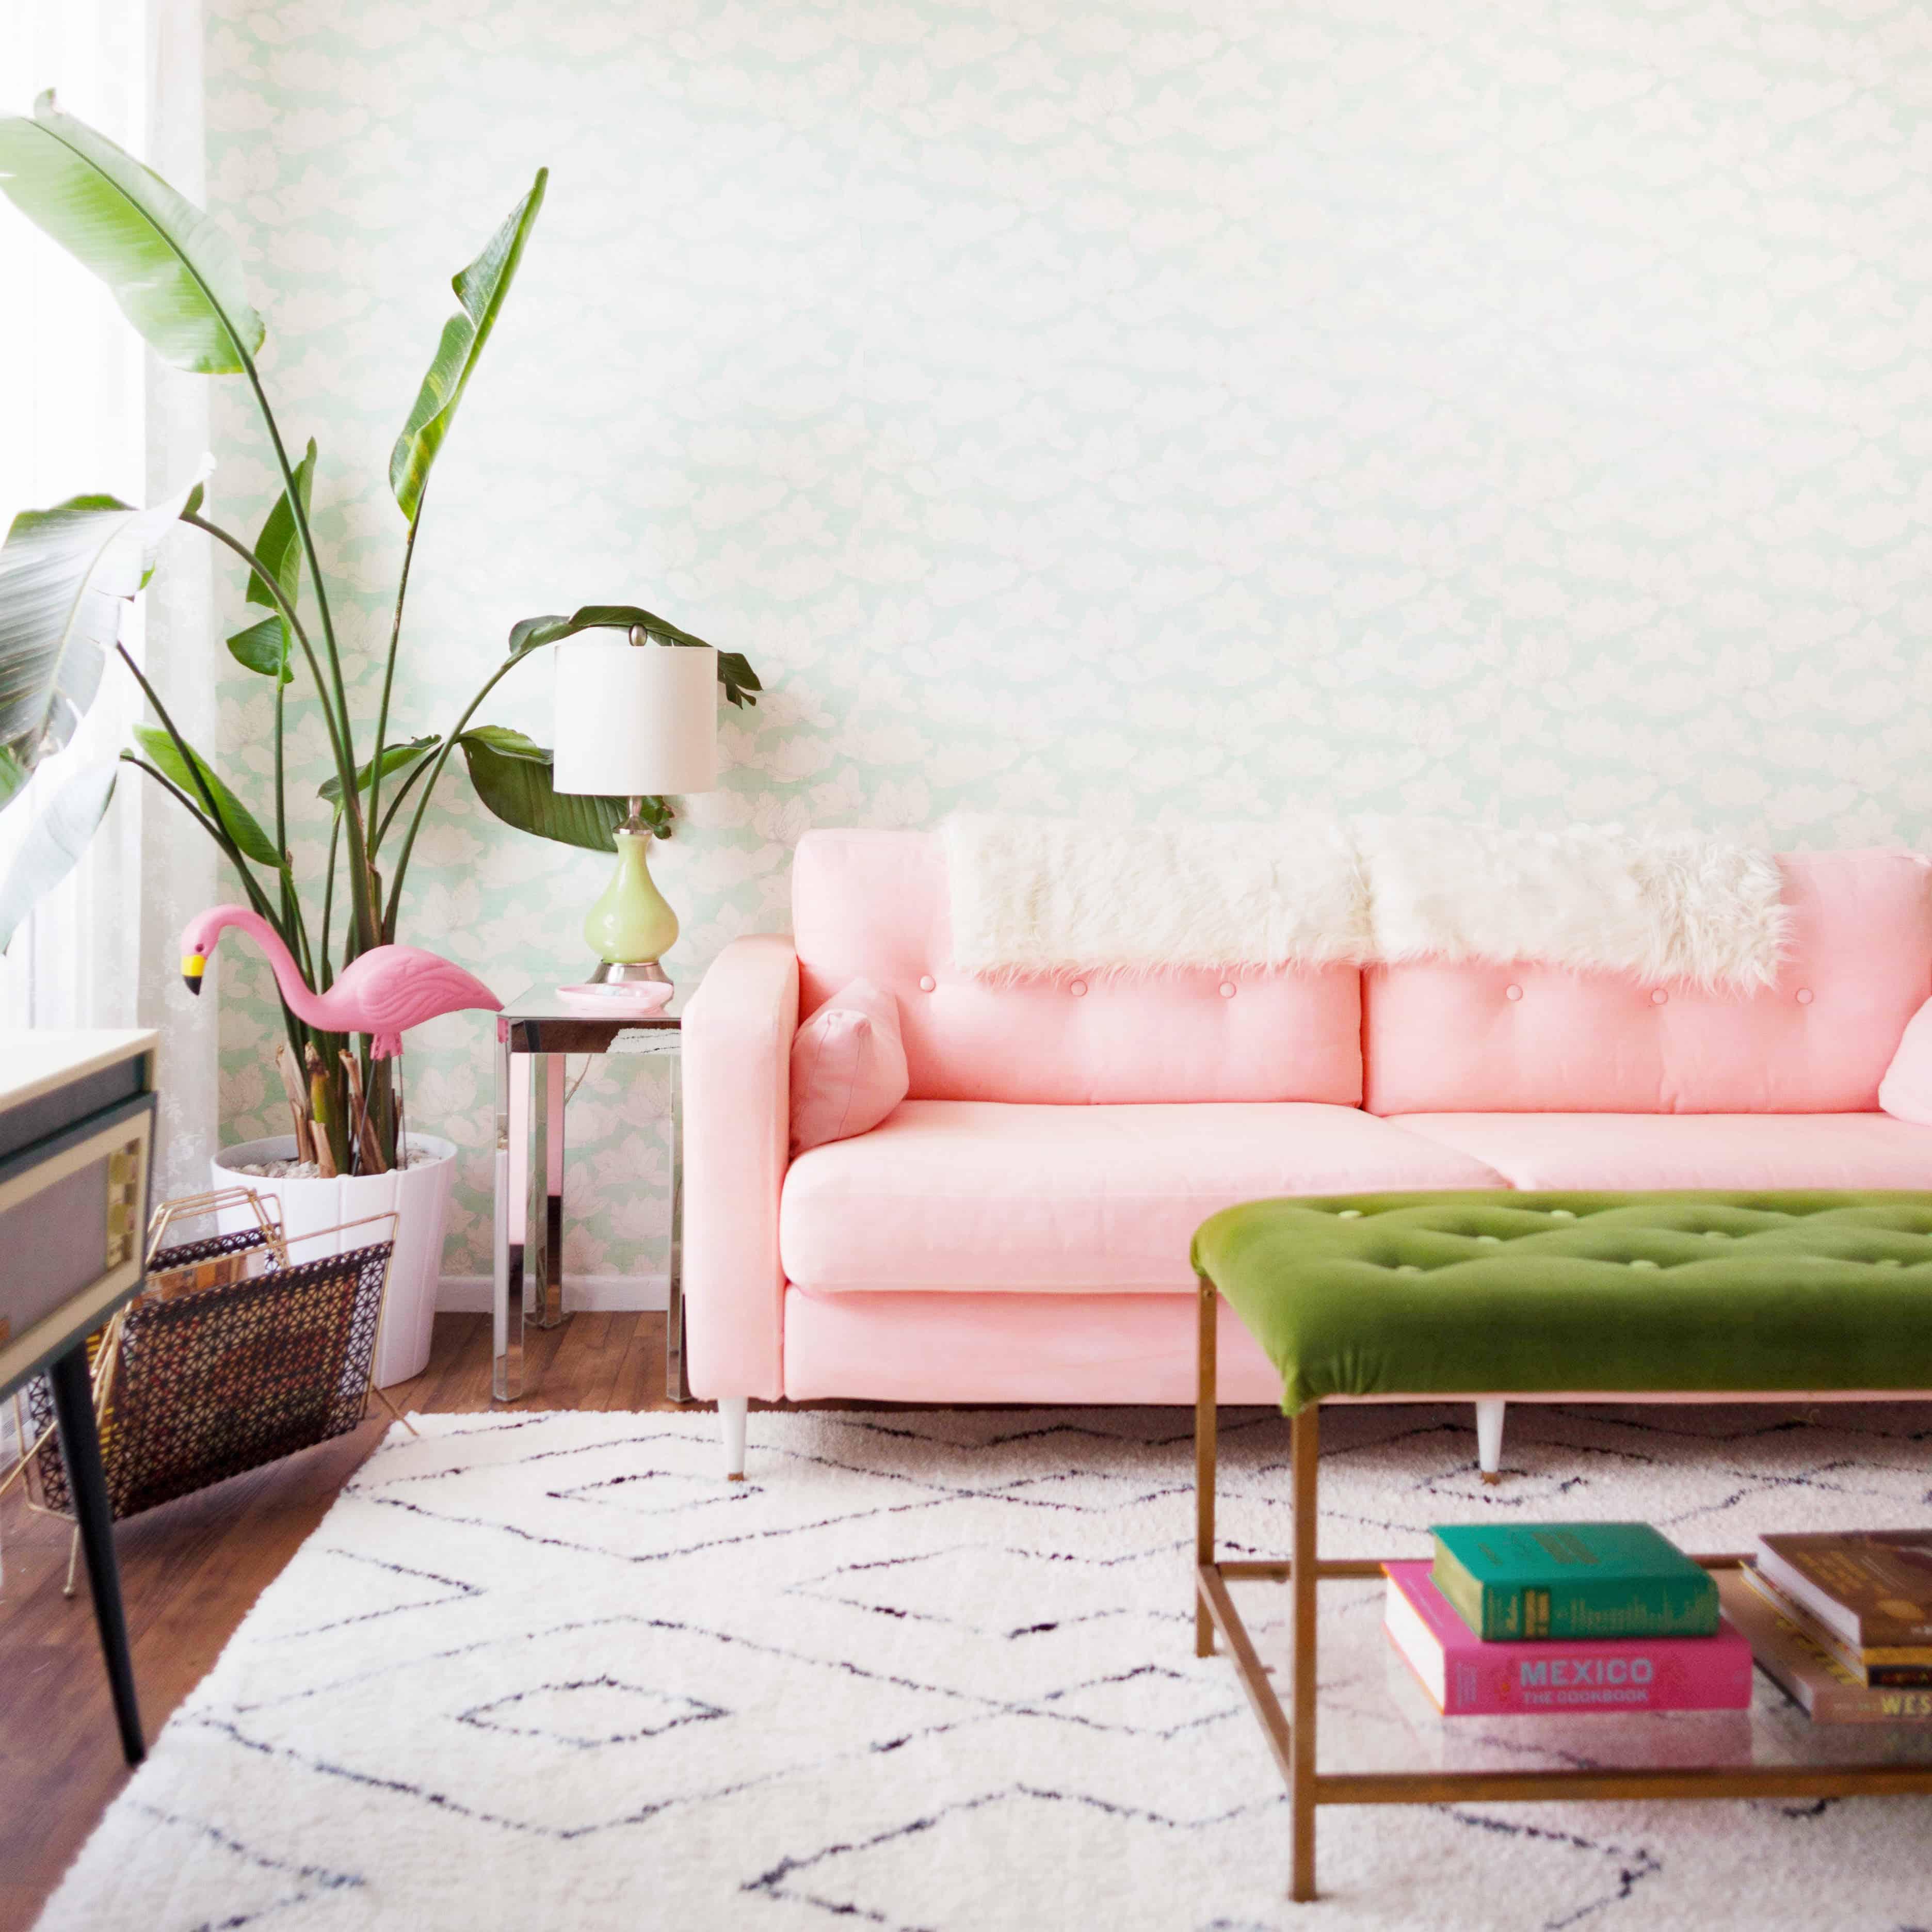 Dyed IKEA Sofa Slipcover